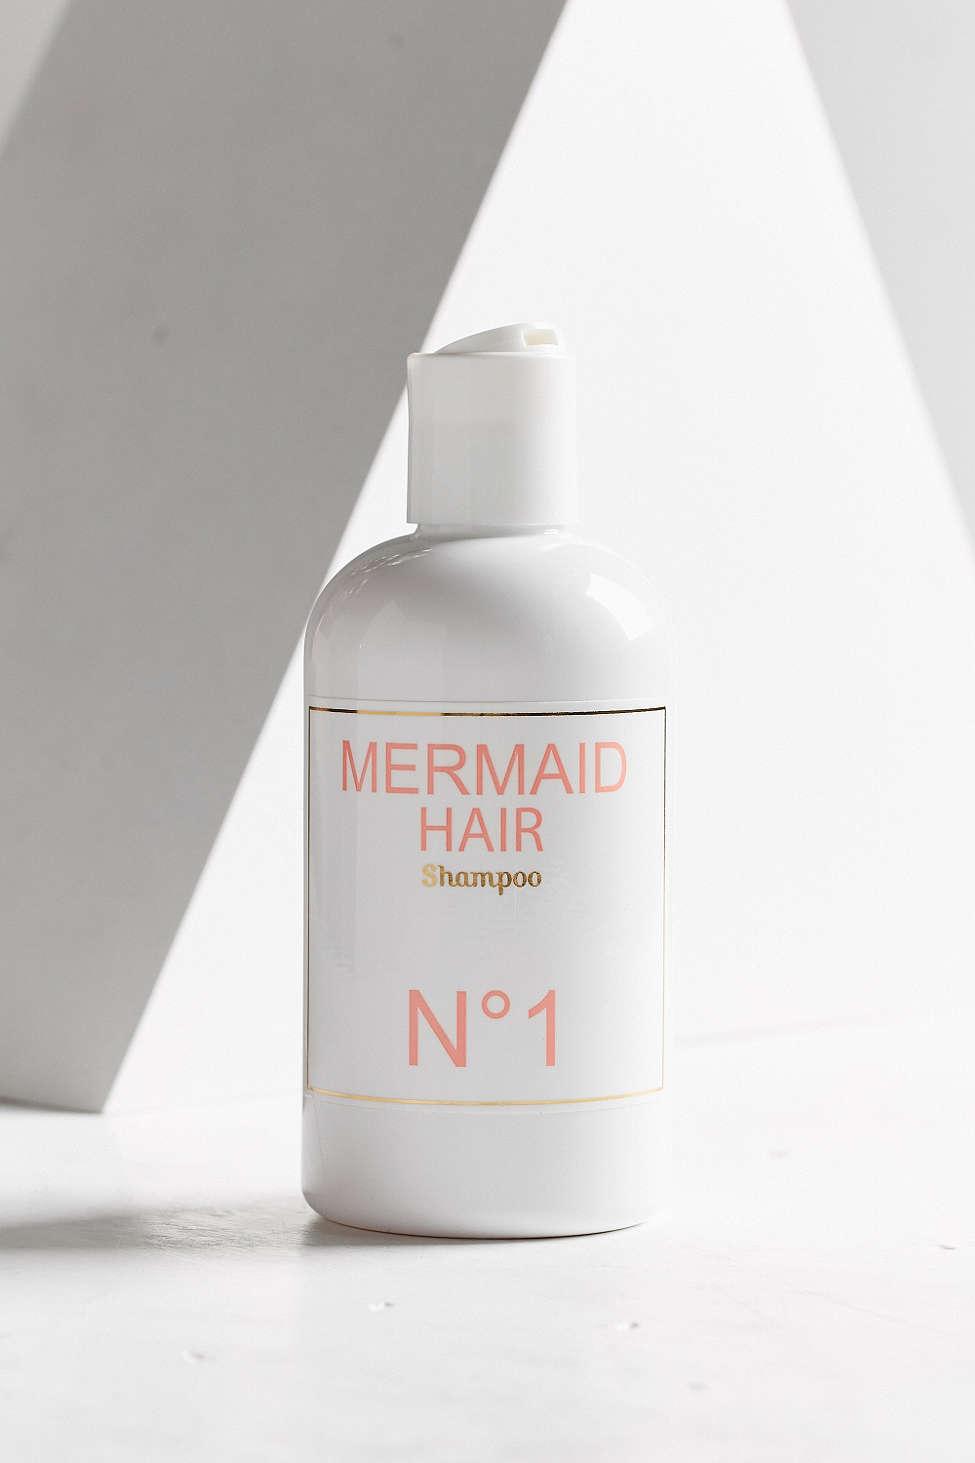 Mermaid Hair Shampoo No.1